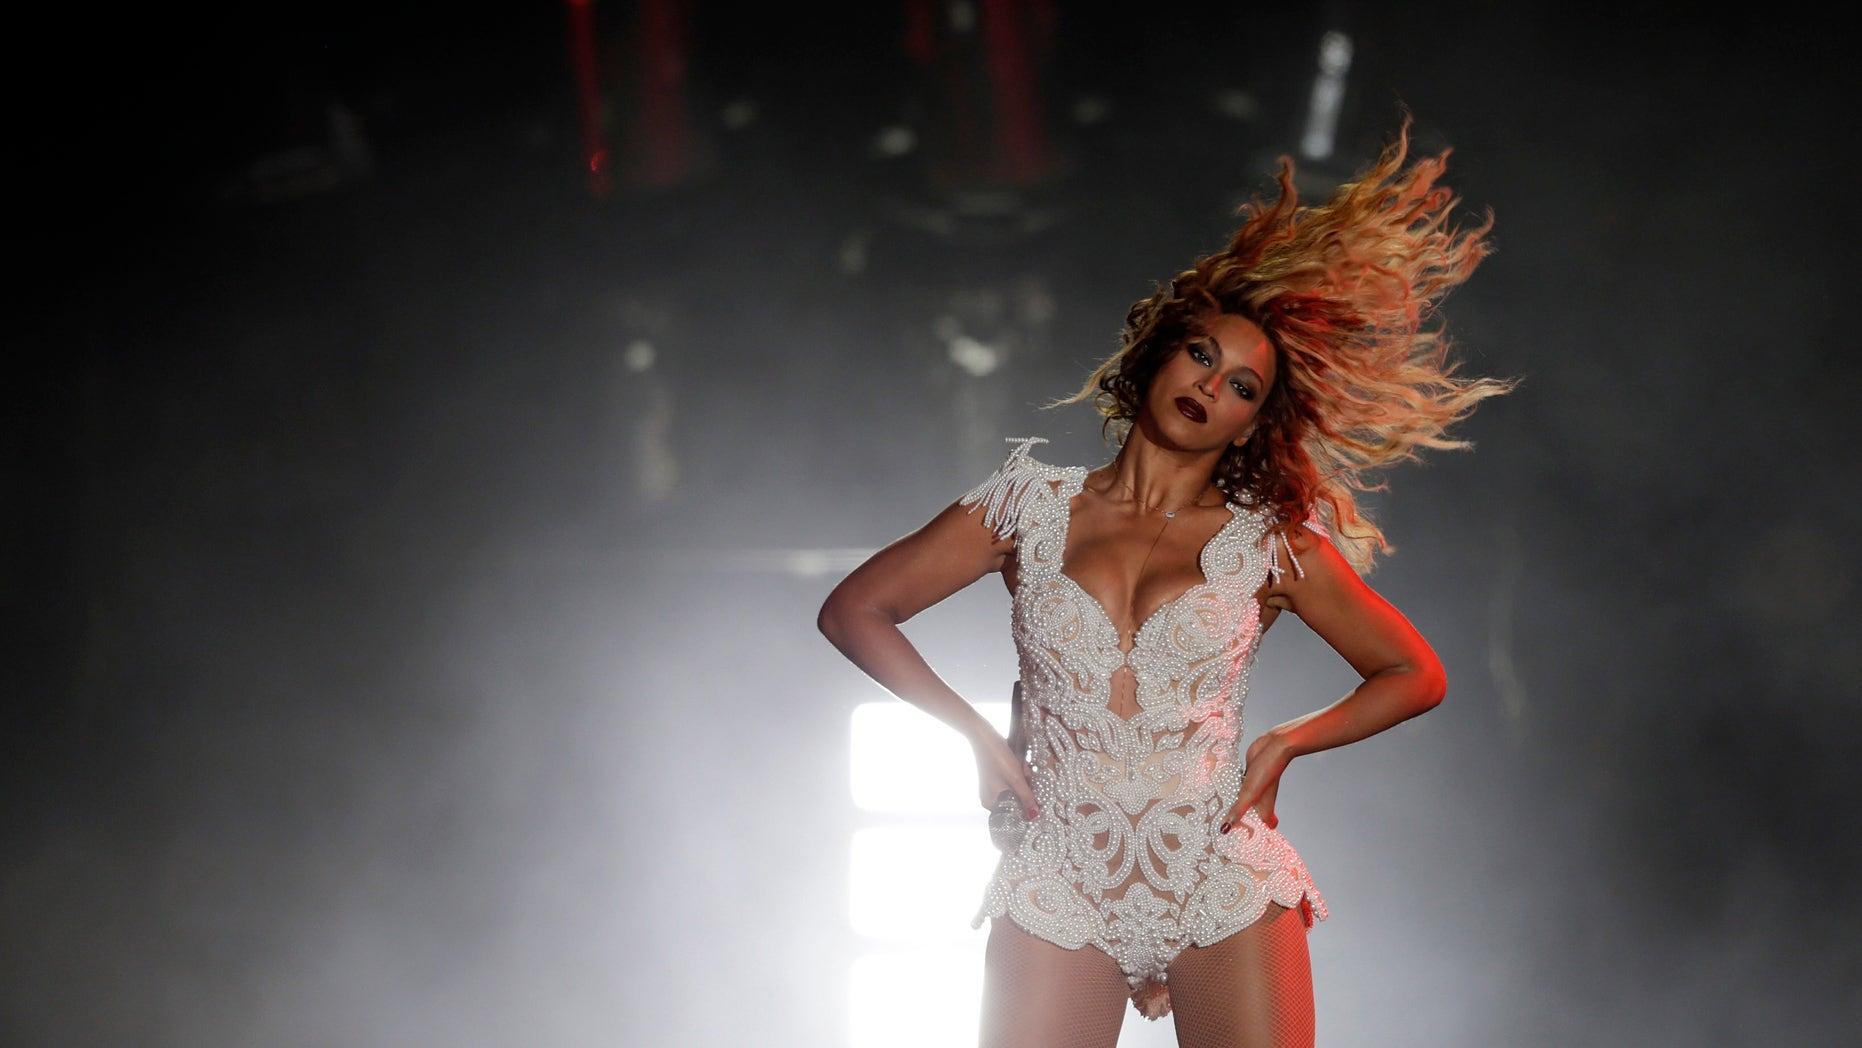 September 14, 2013. Singer Beyonce performs at the Rock in Rio Music Festival in Rio de Janeiro.